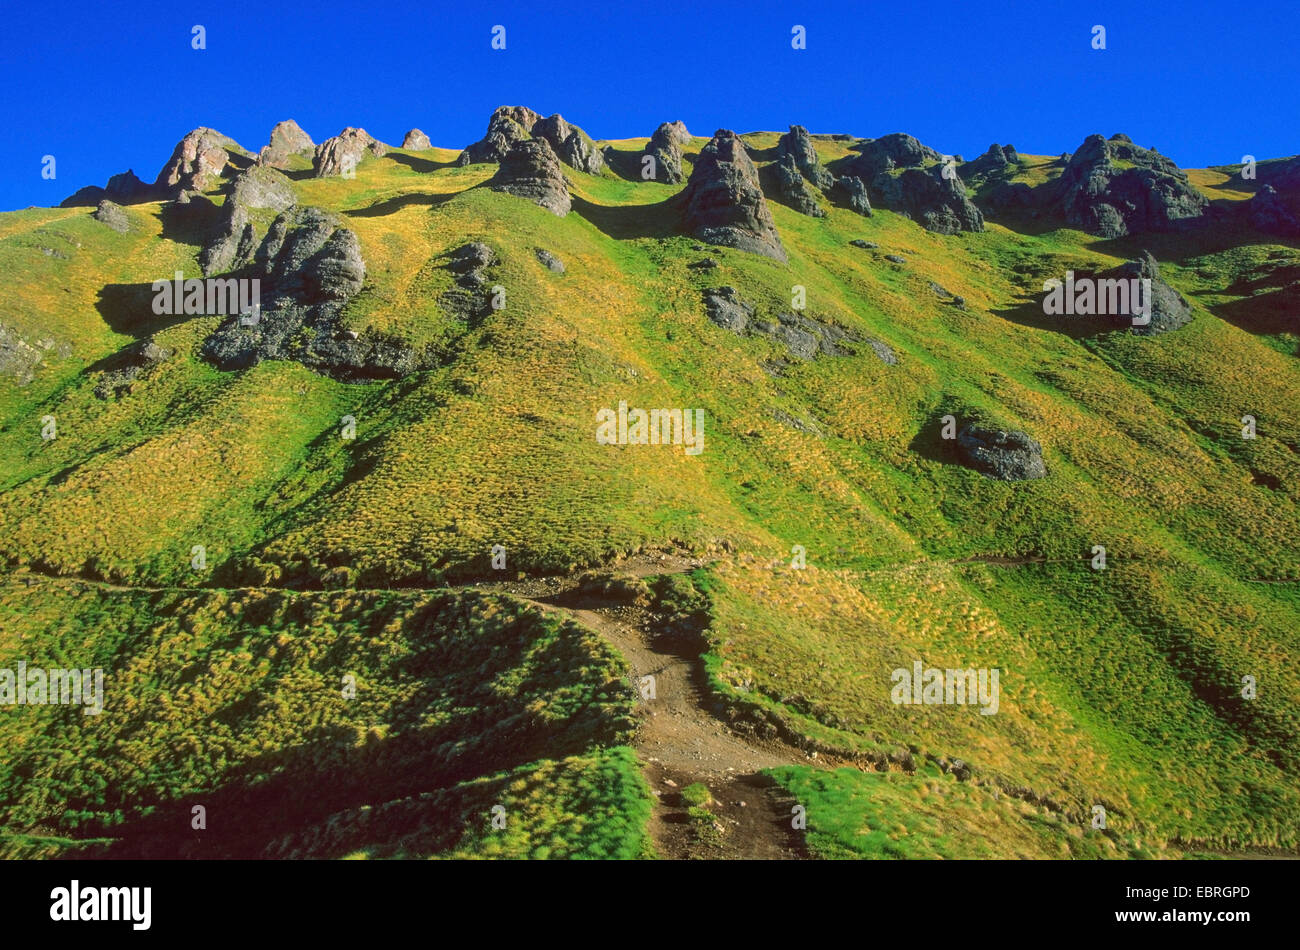 rock formation at Pordoi Pass, Italy, South Tyrol, Dolomites - Stock Image